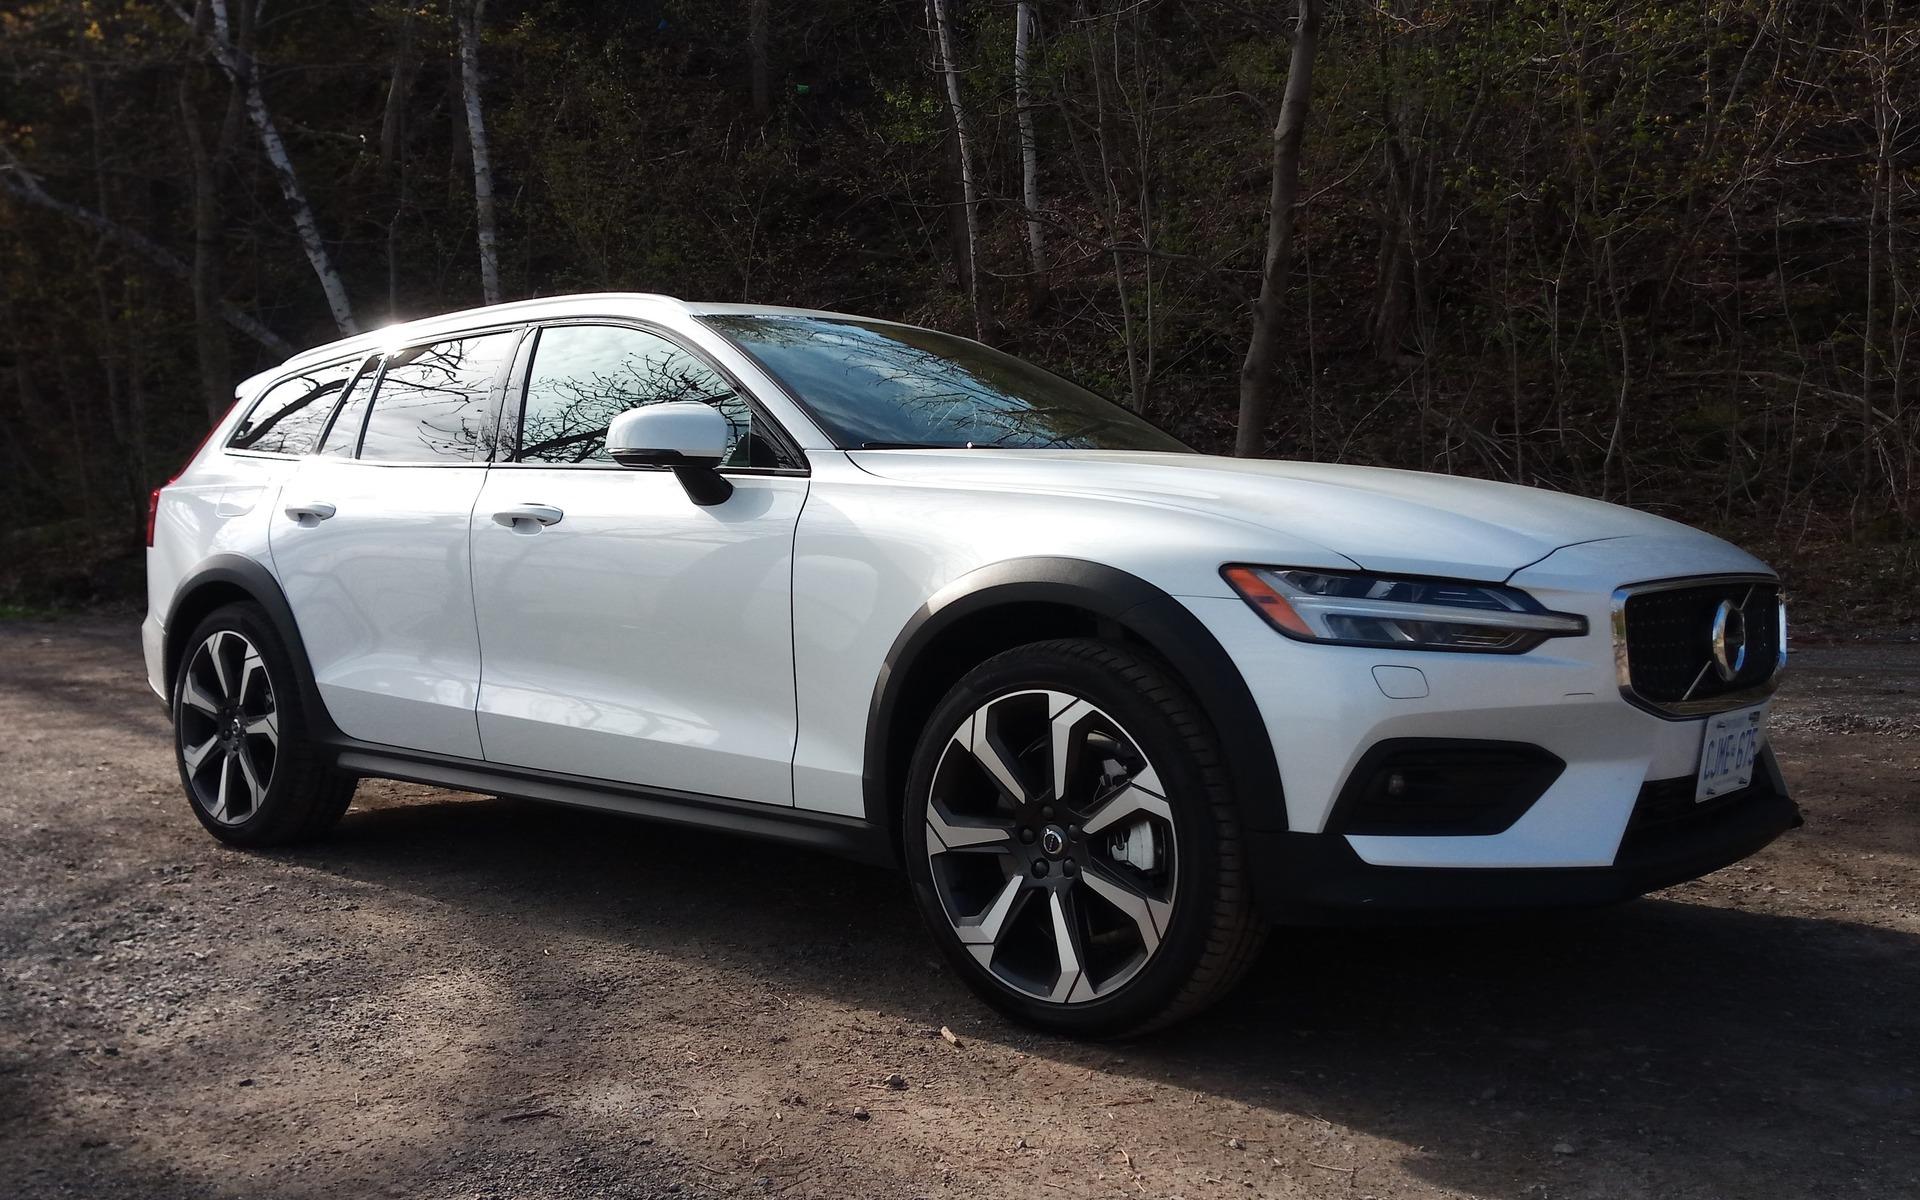 2019 Volvo V60 Cross Country More Fun Than An Suv The Car